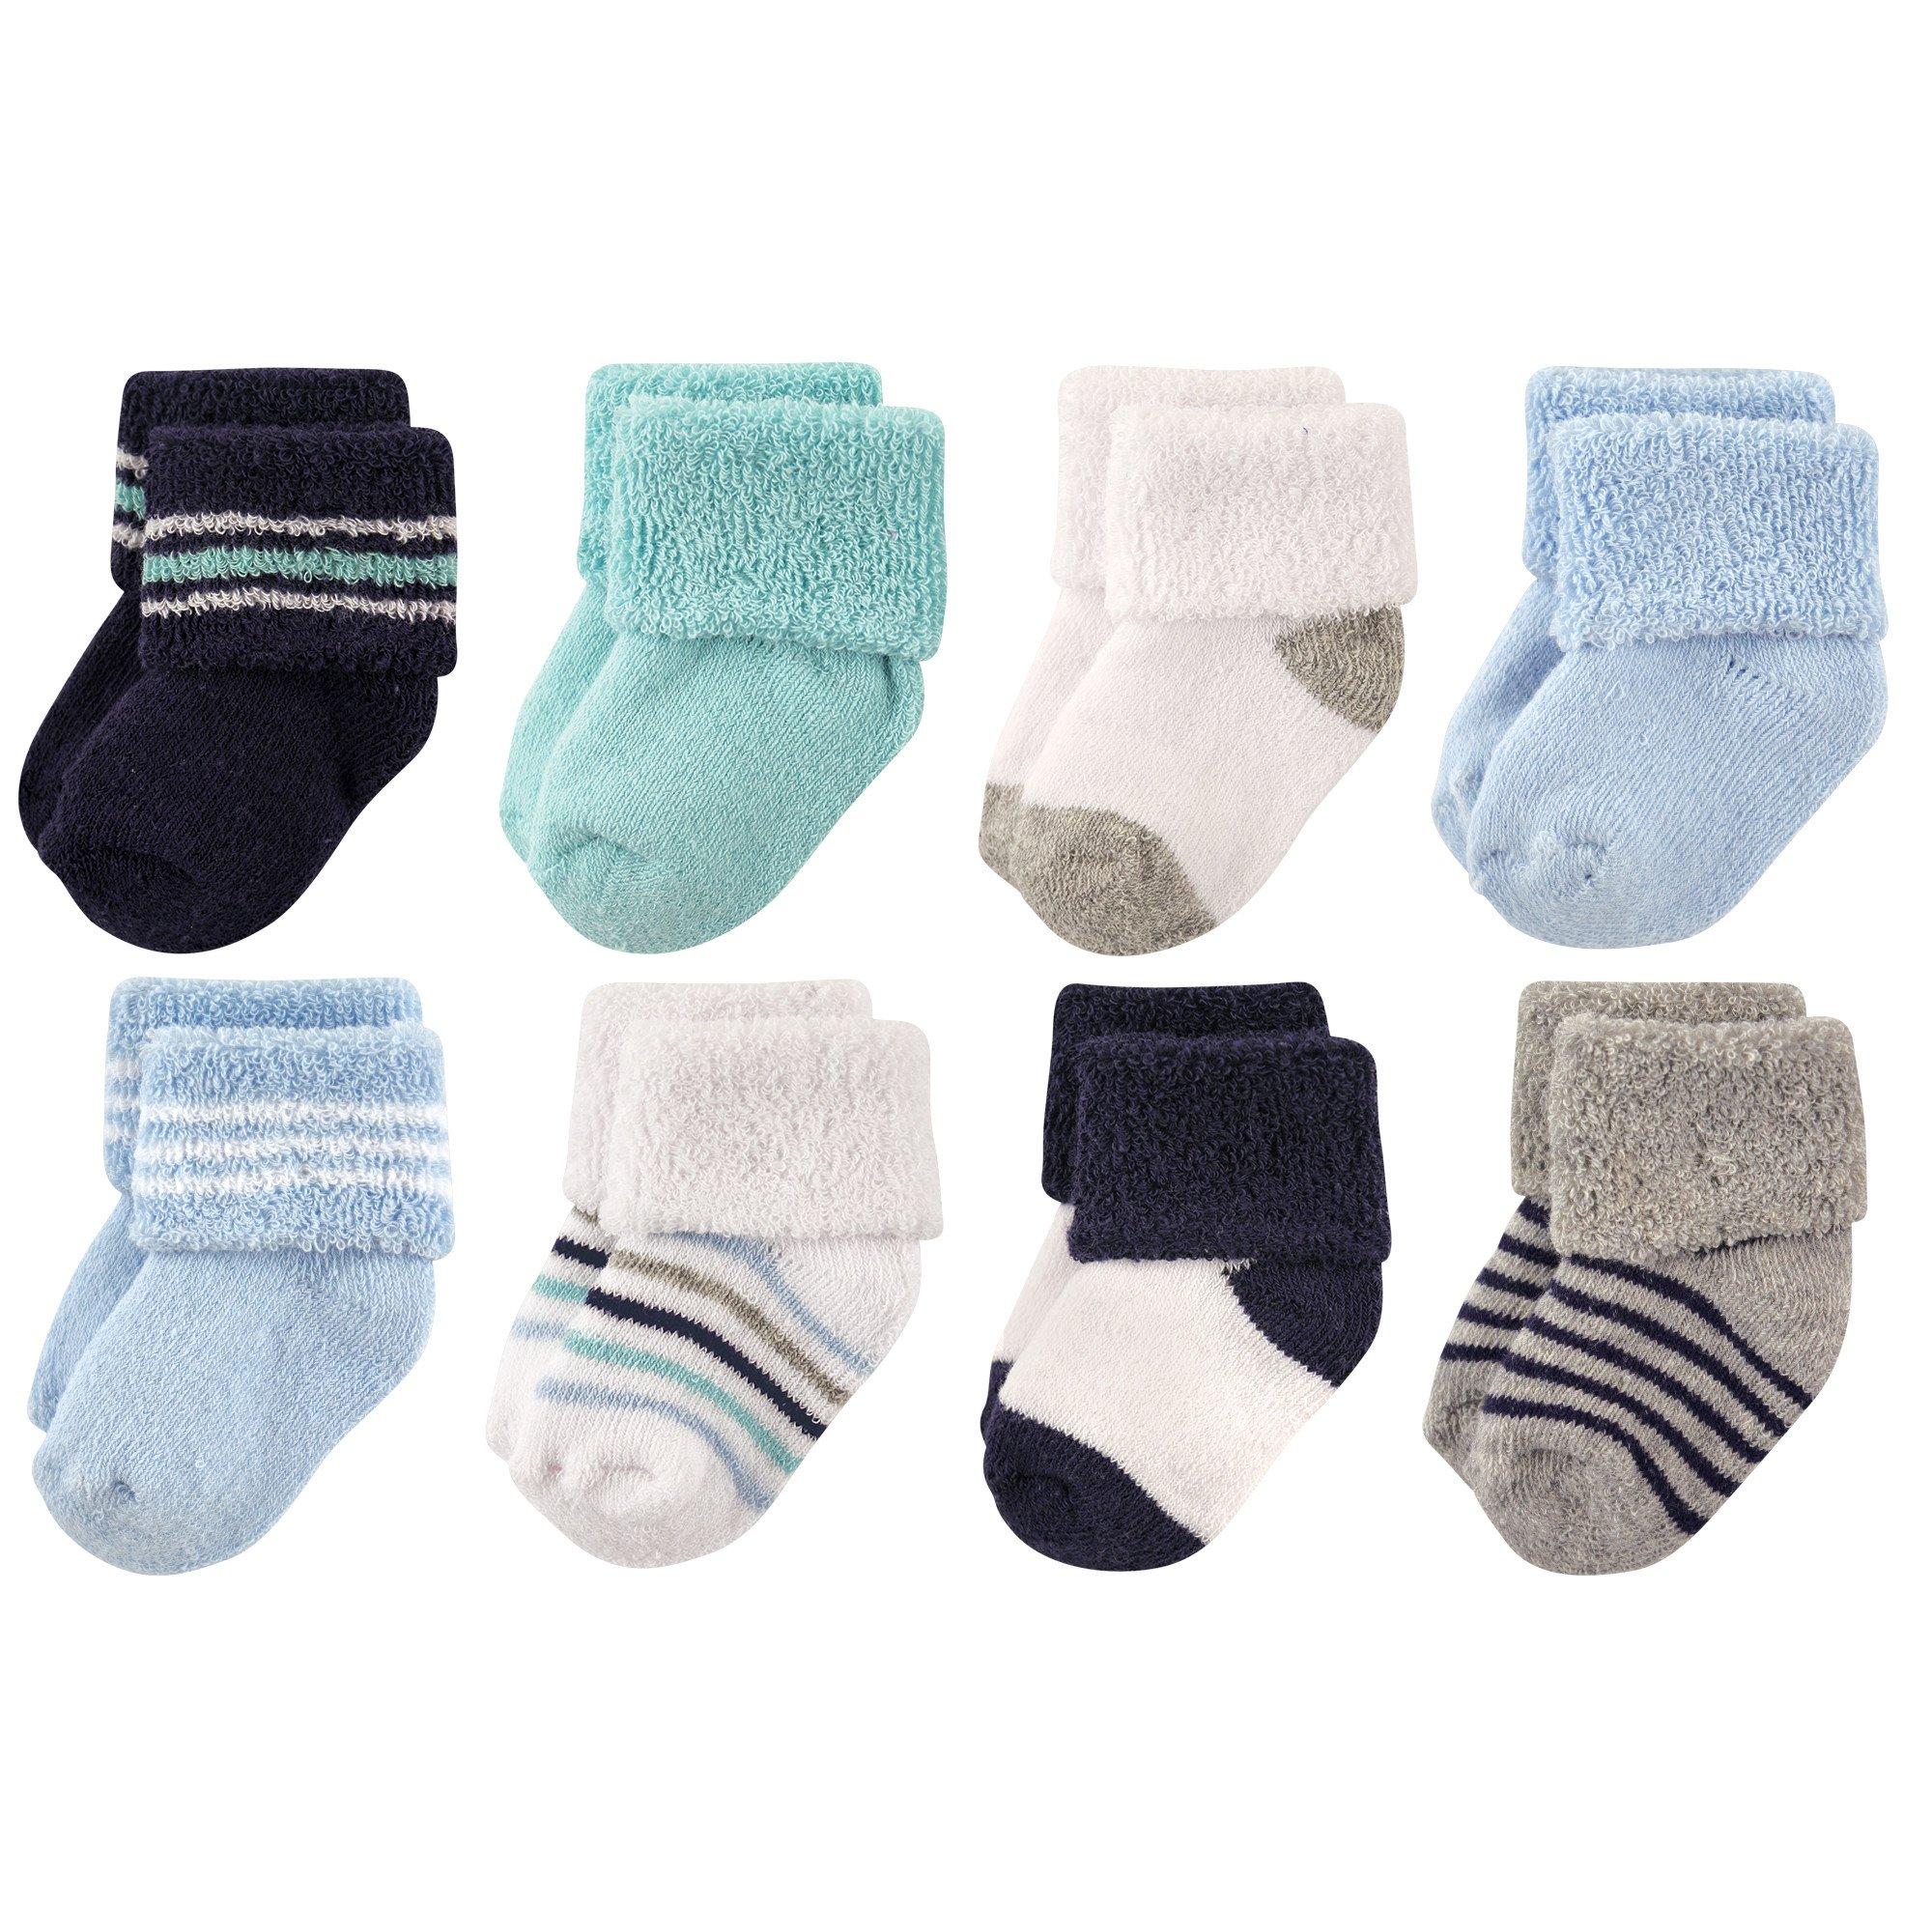 Luvable Friends Unisex Baby Socks, Mint Navy Stripe